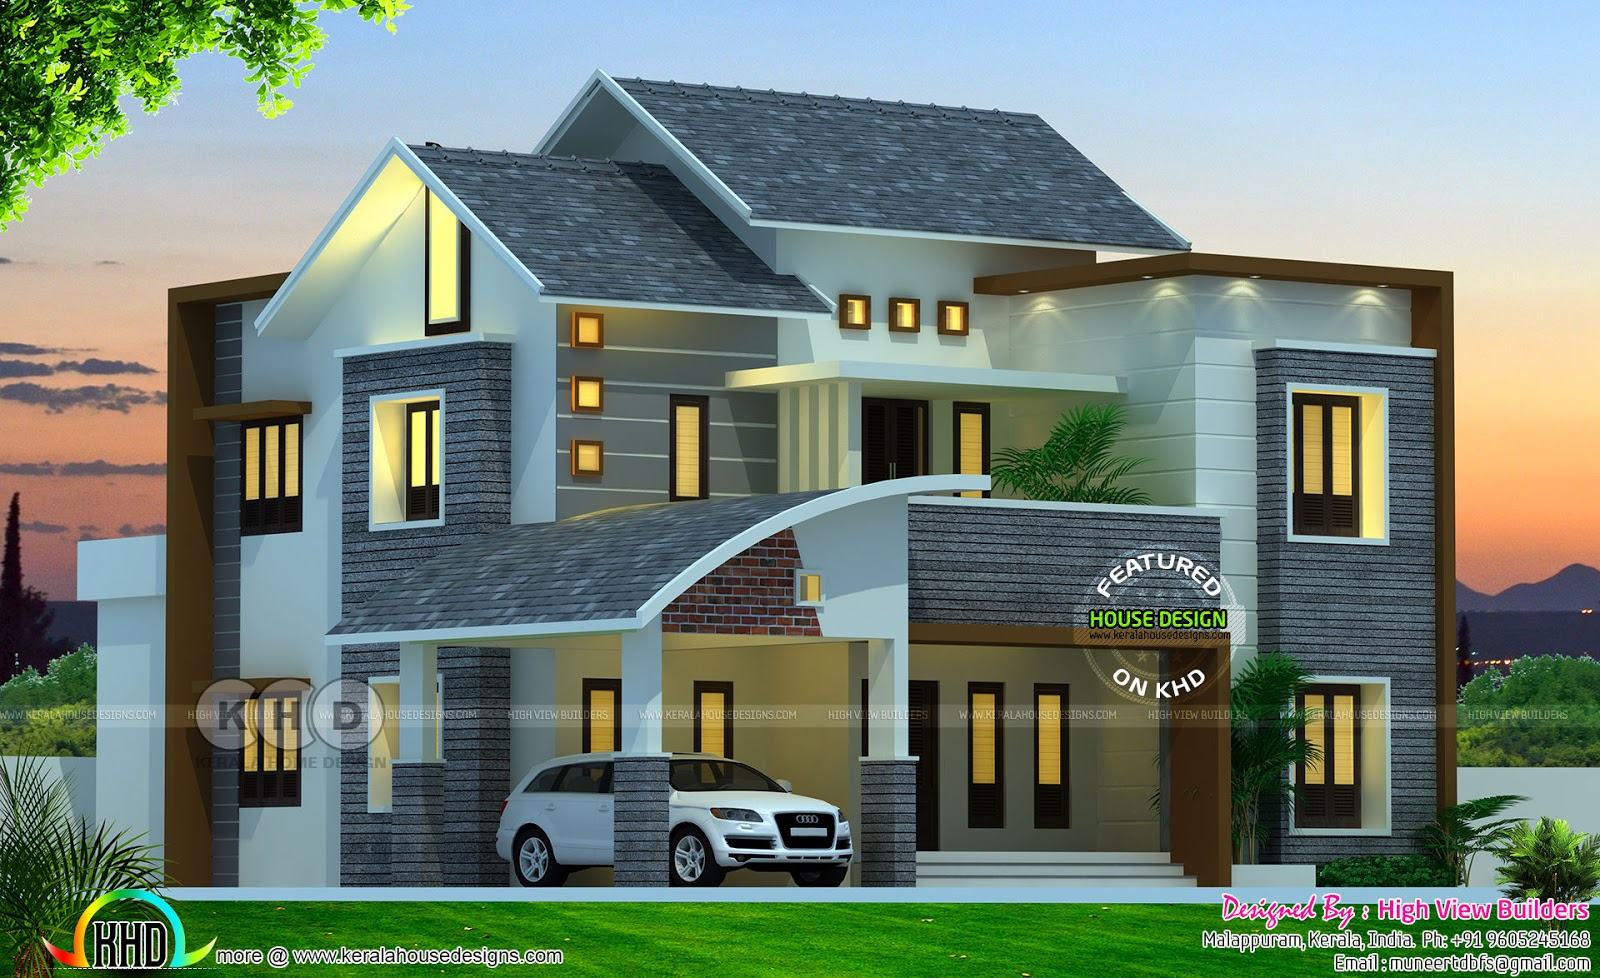 Modern Kerala home design by High View Builders - Kerala ...